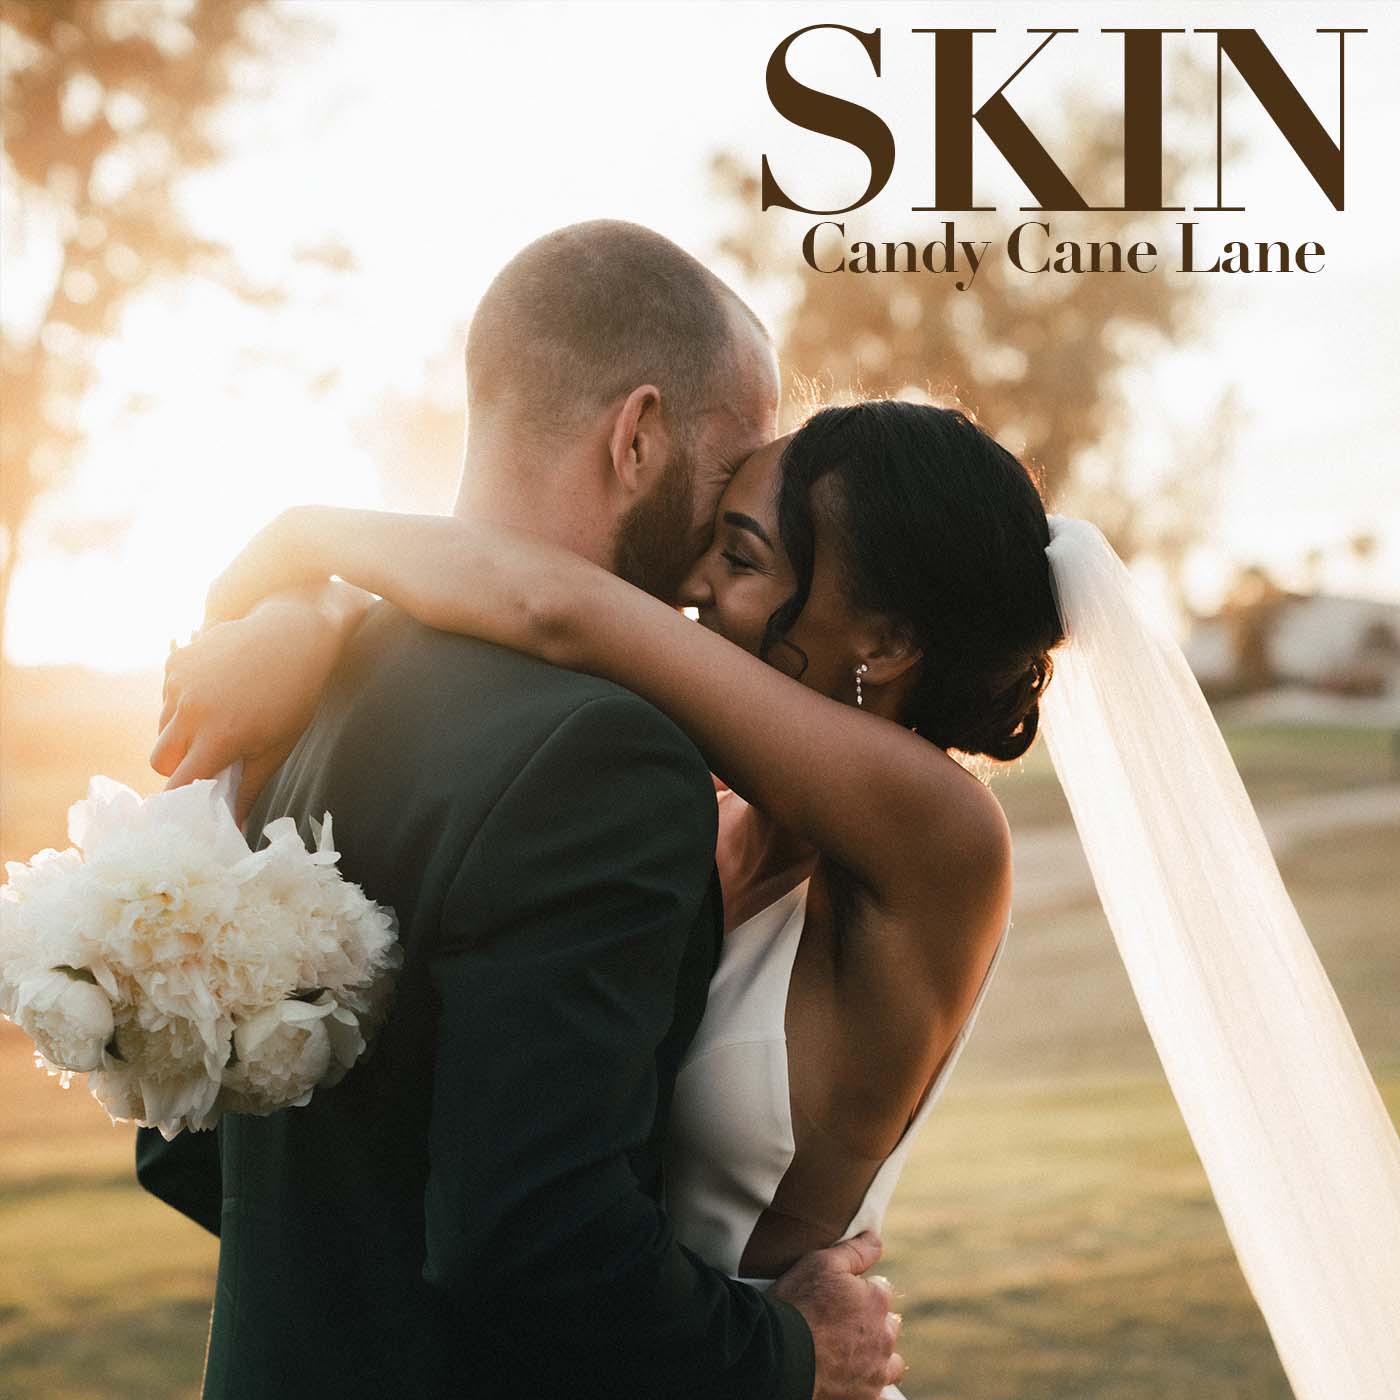 Skin - Candy Cane Lane